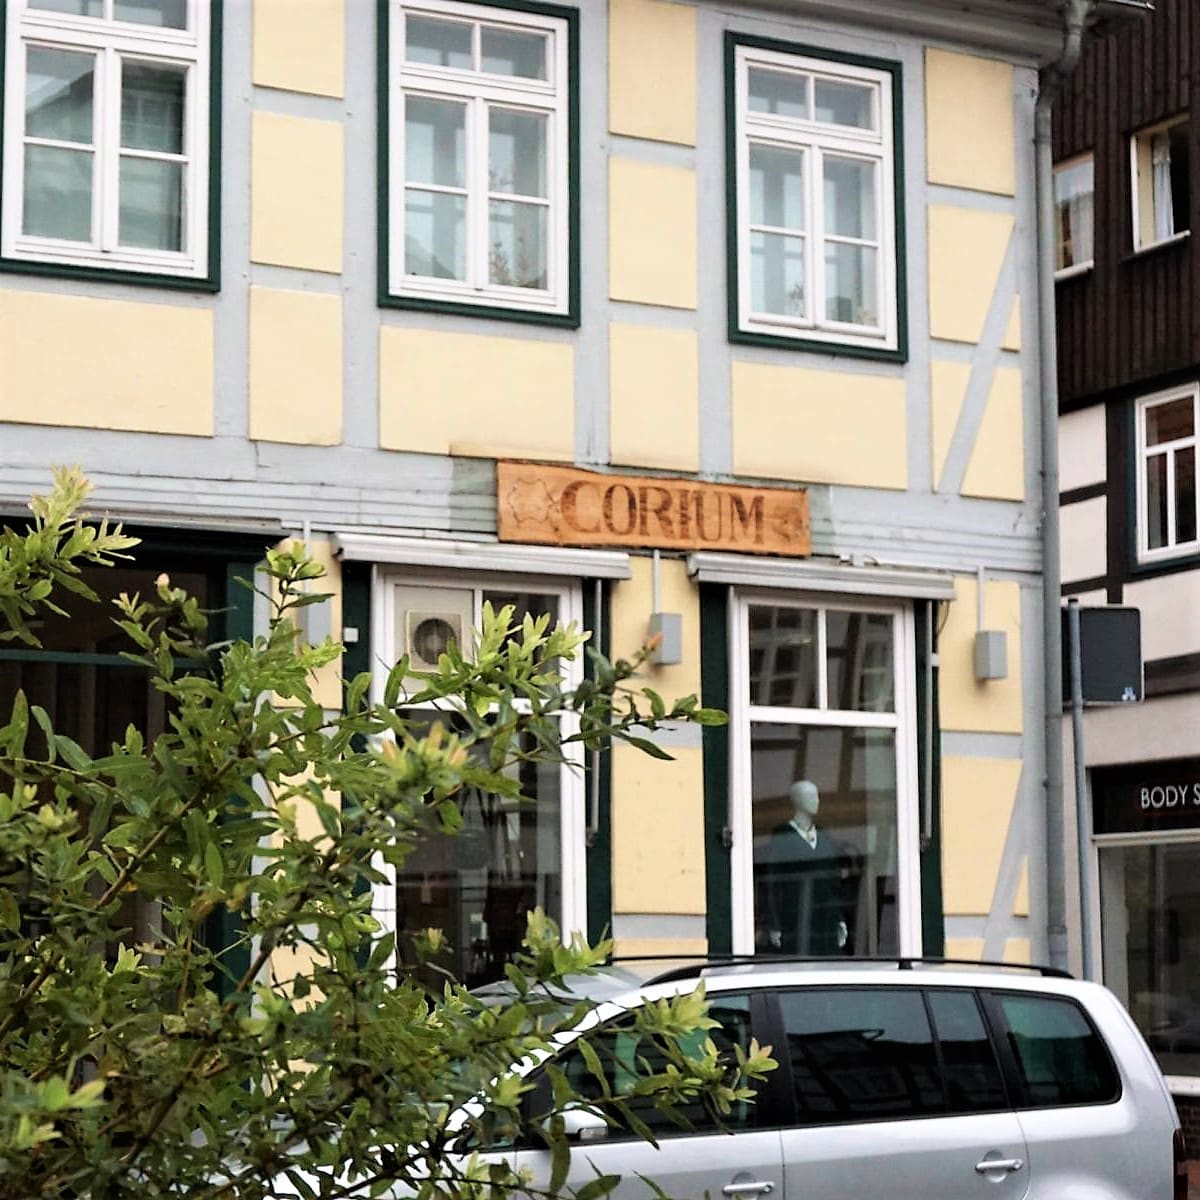 Style Hannover Corium 2 - Corium – Spanien in Hannover